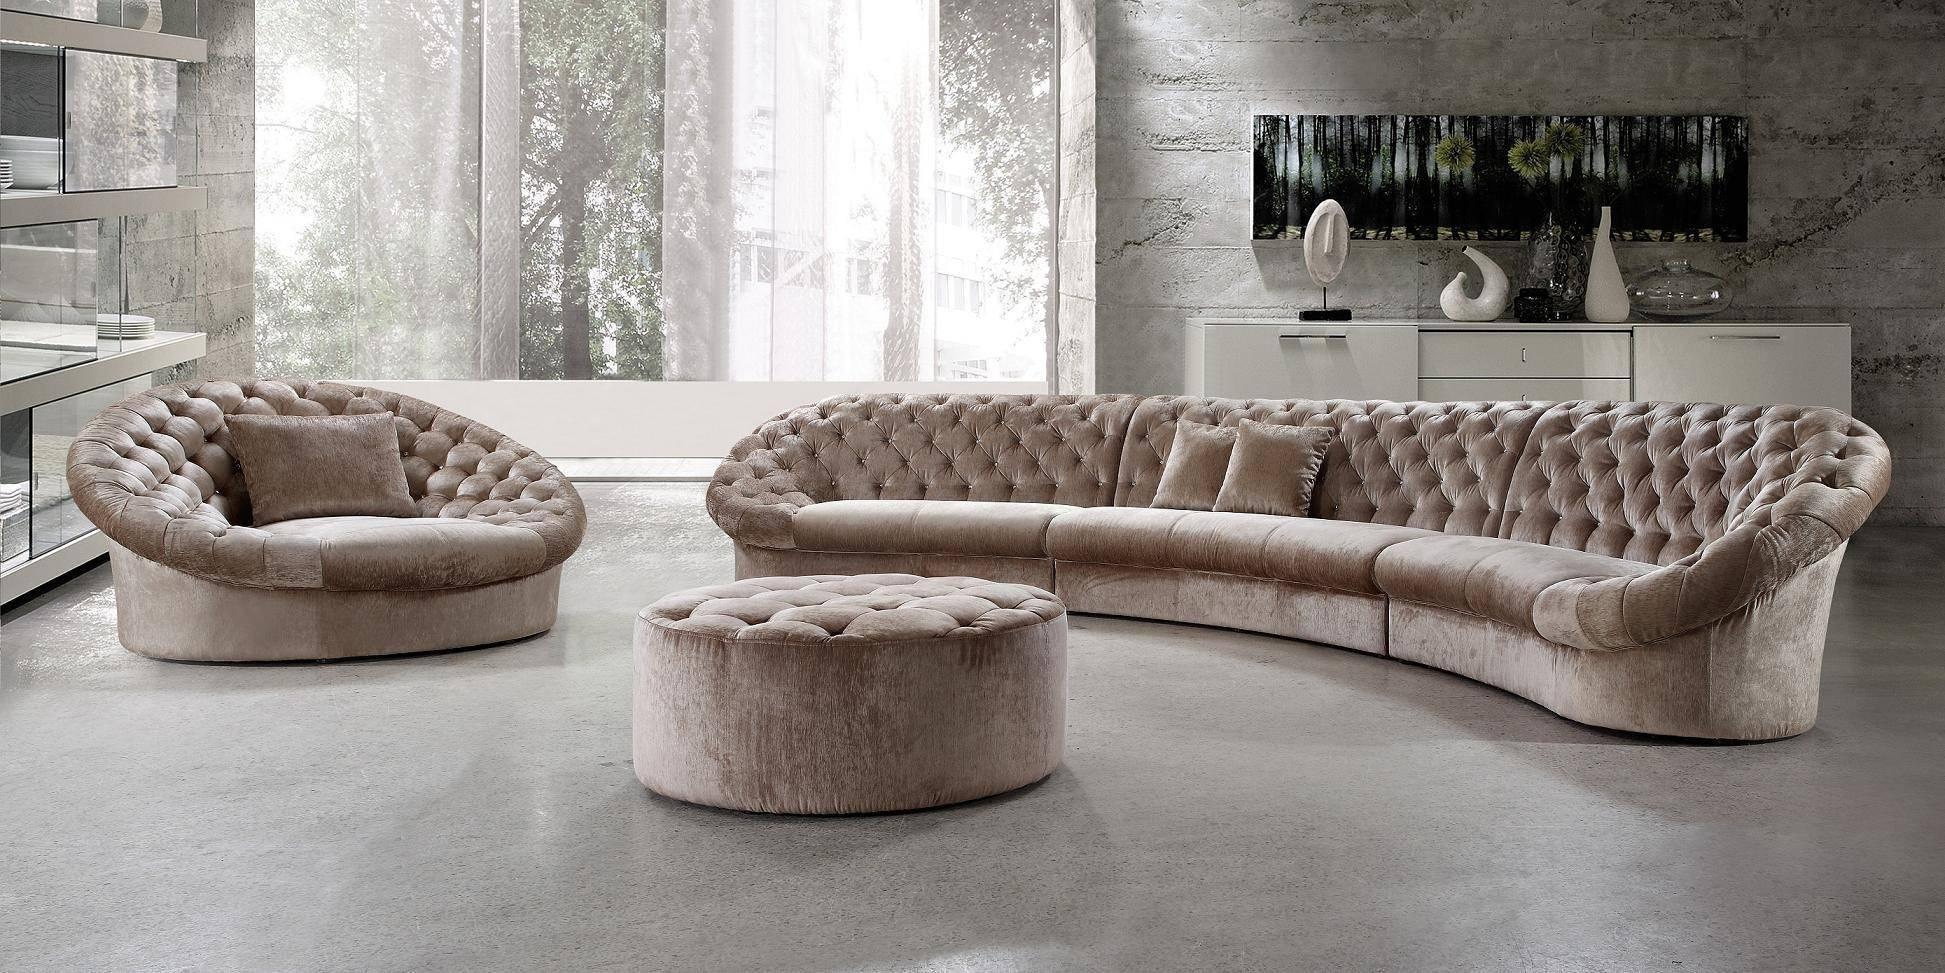 Tufted Sofa Set Cheap | Tehranmix Decoration Within Cheap Tufted Sofas (View 29 of 30)